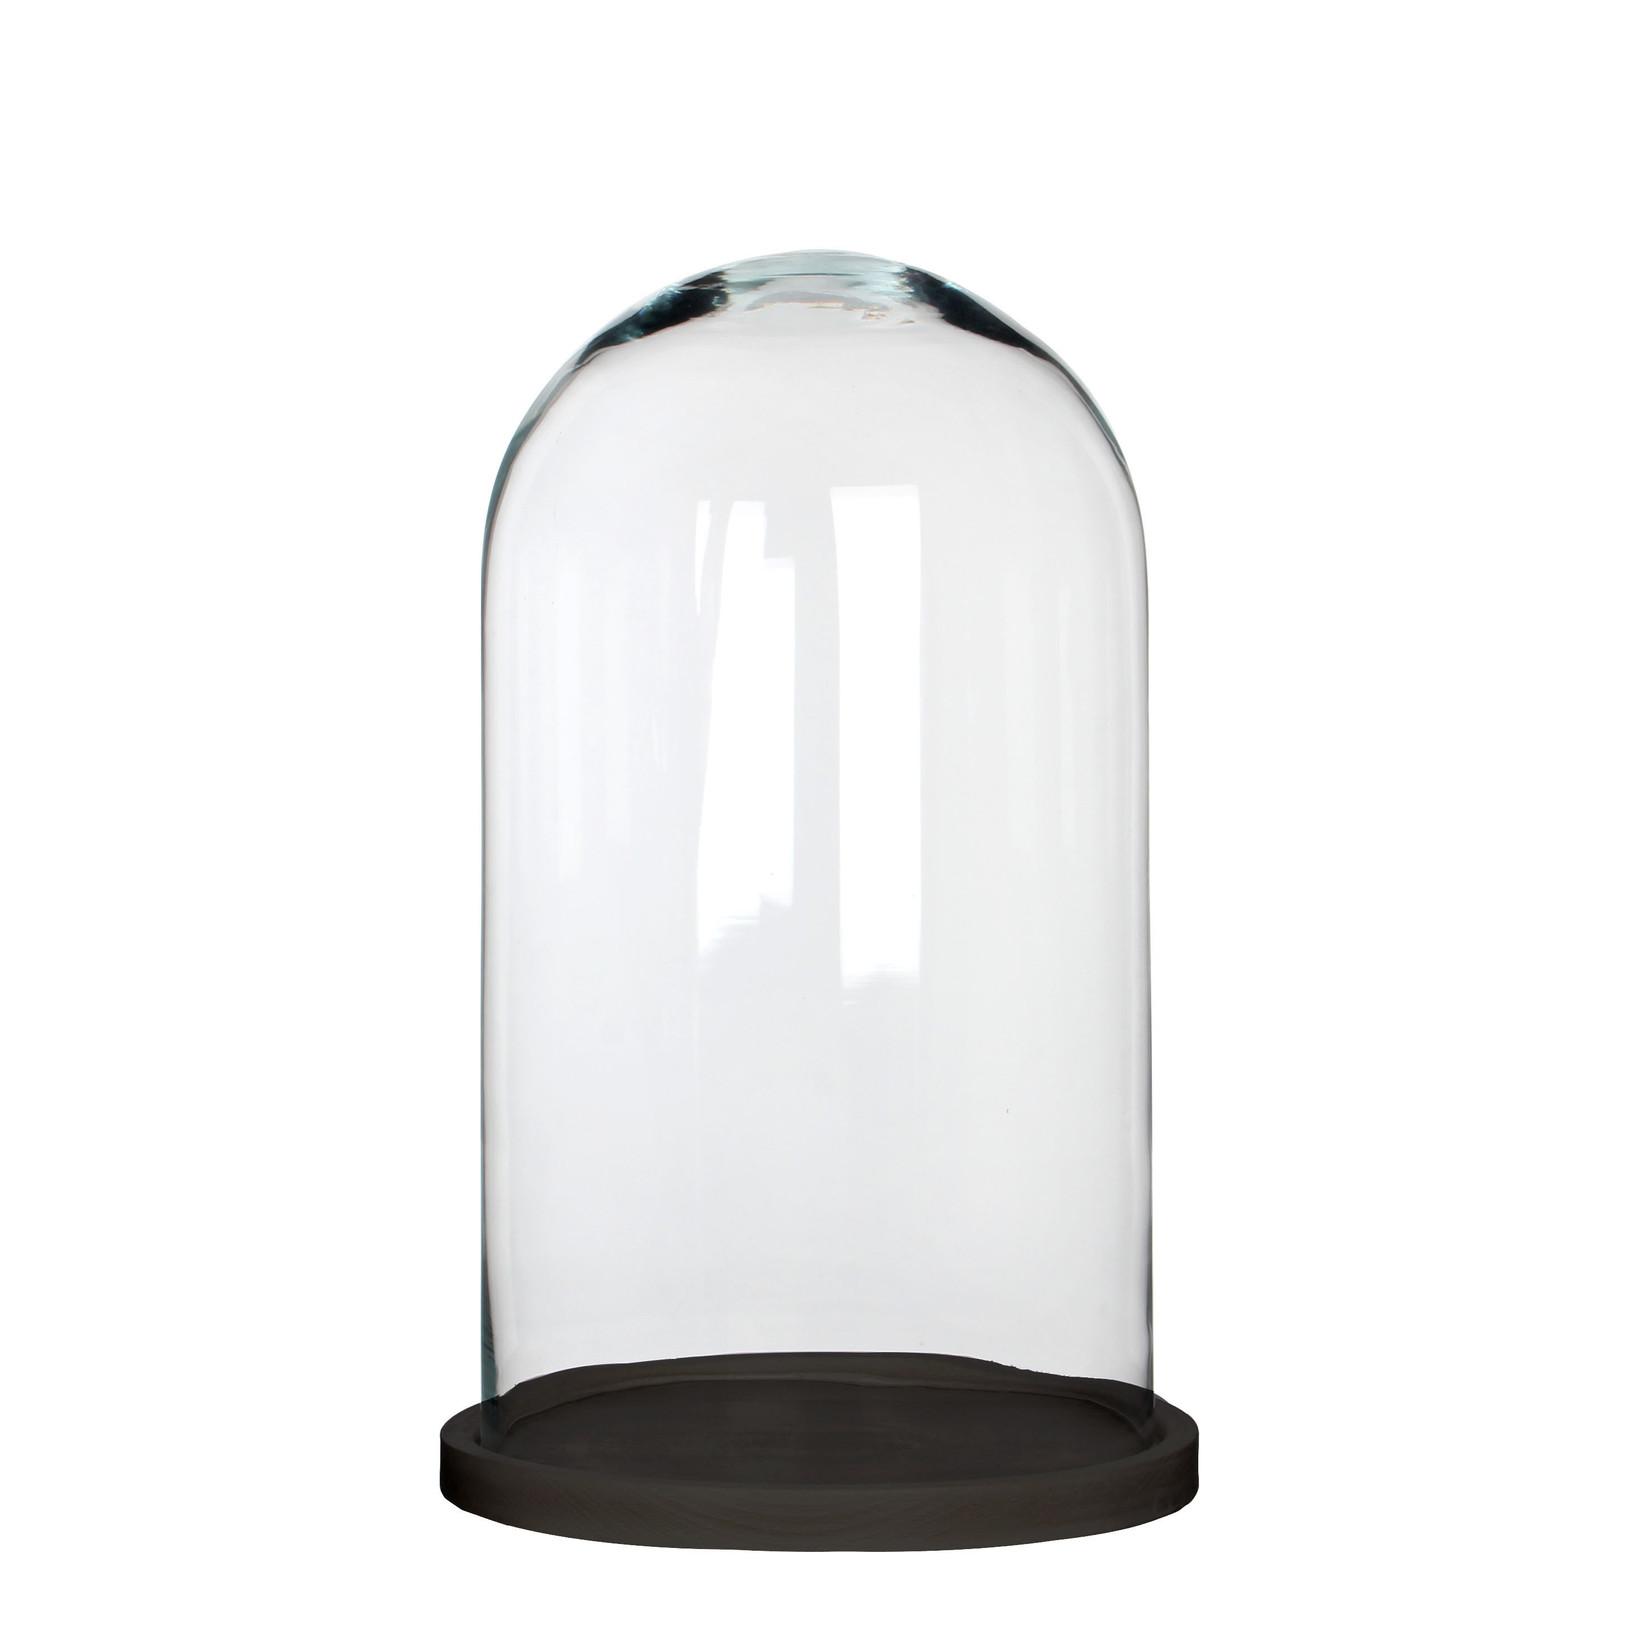 MiCa 1070567 Hella stolp glas op bord zwart